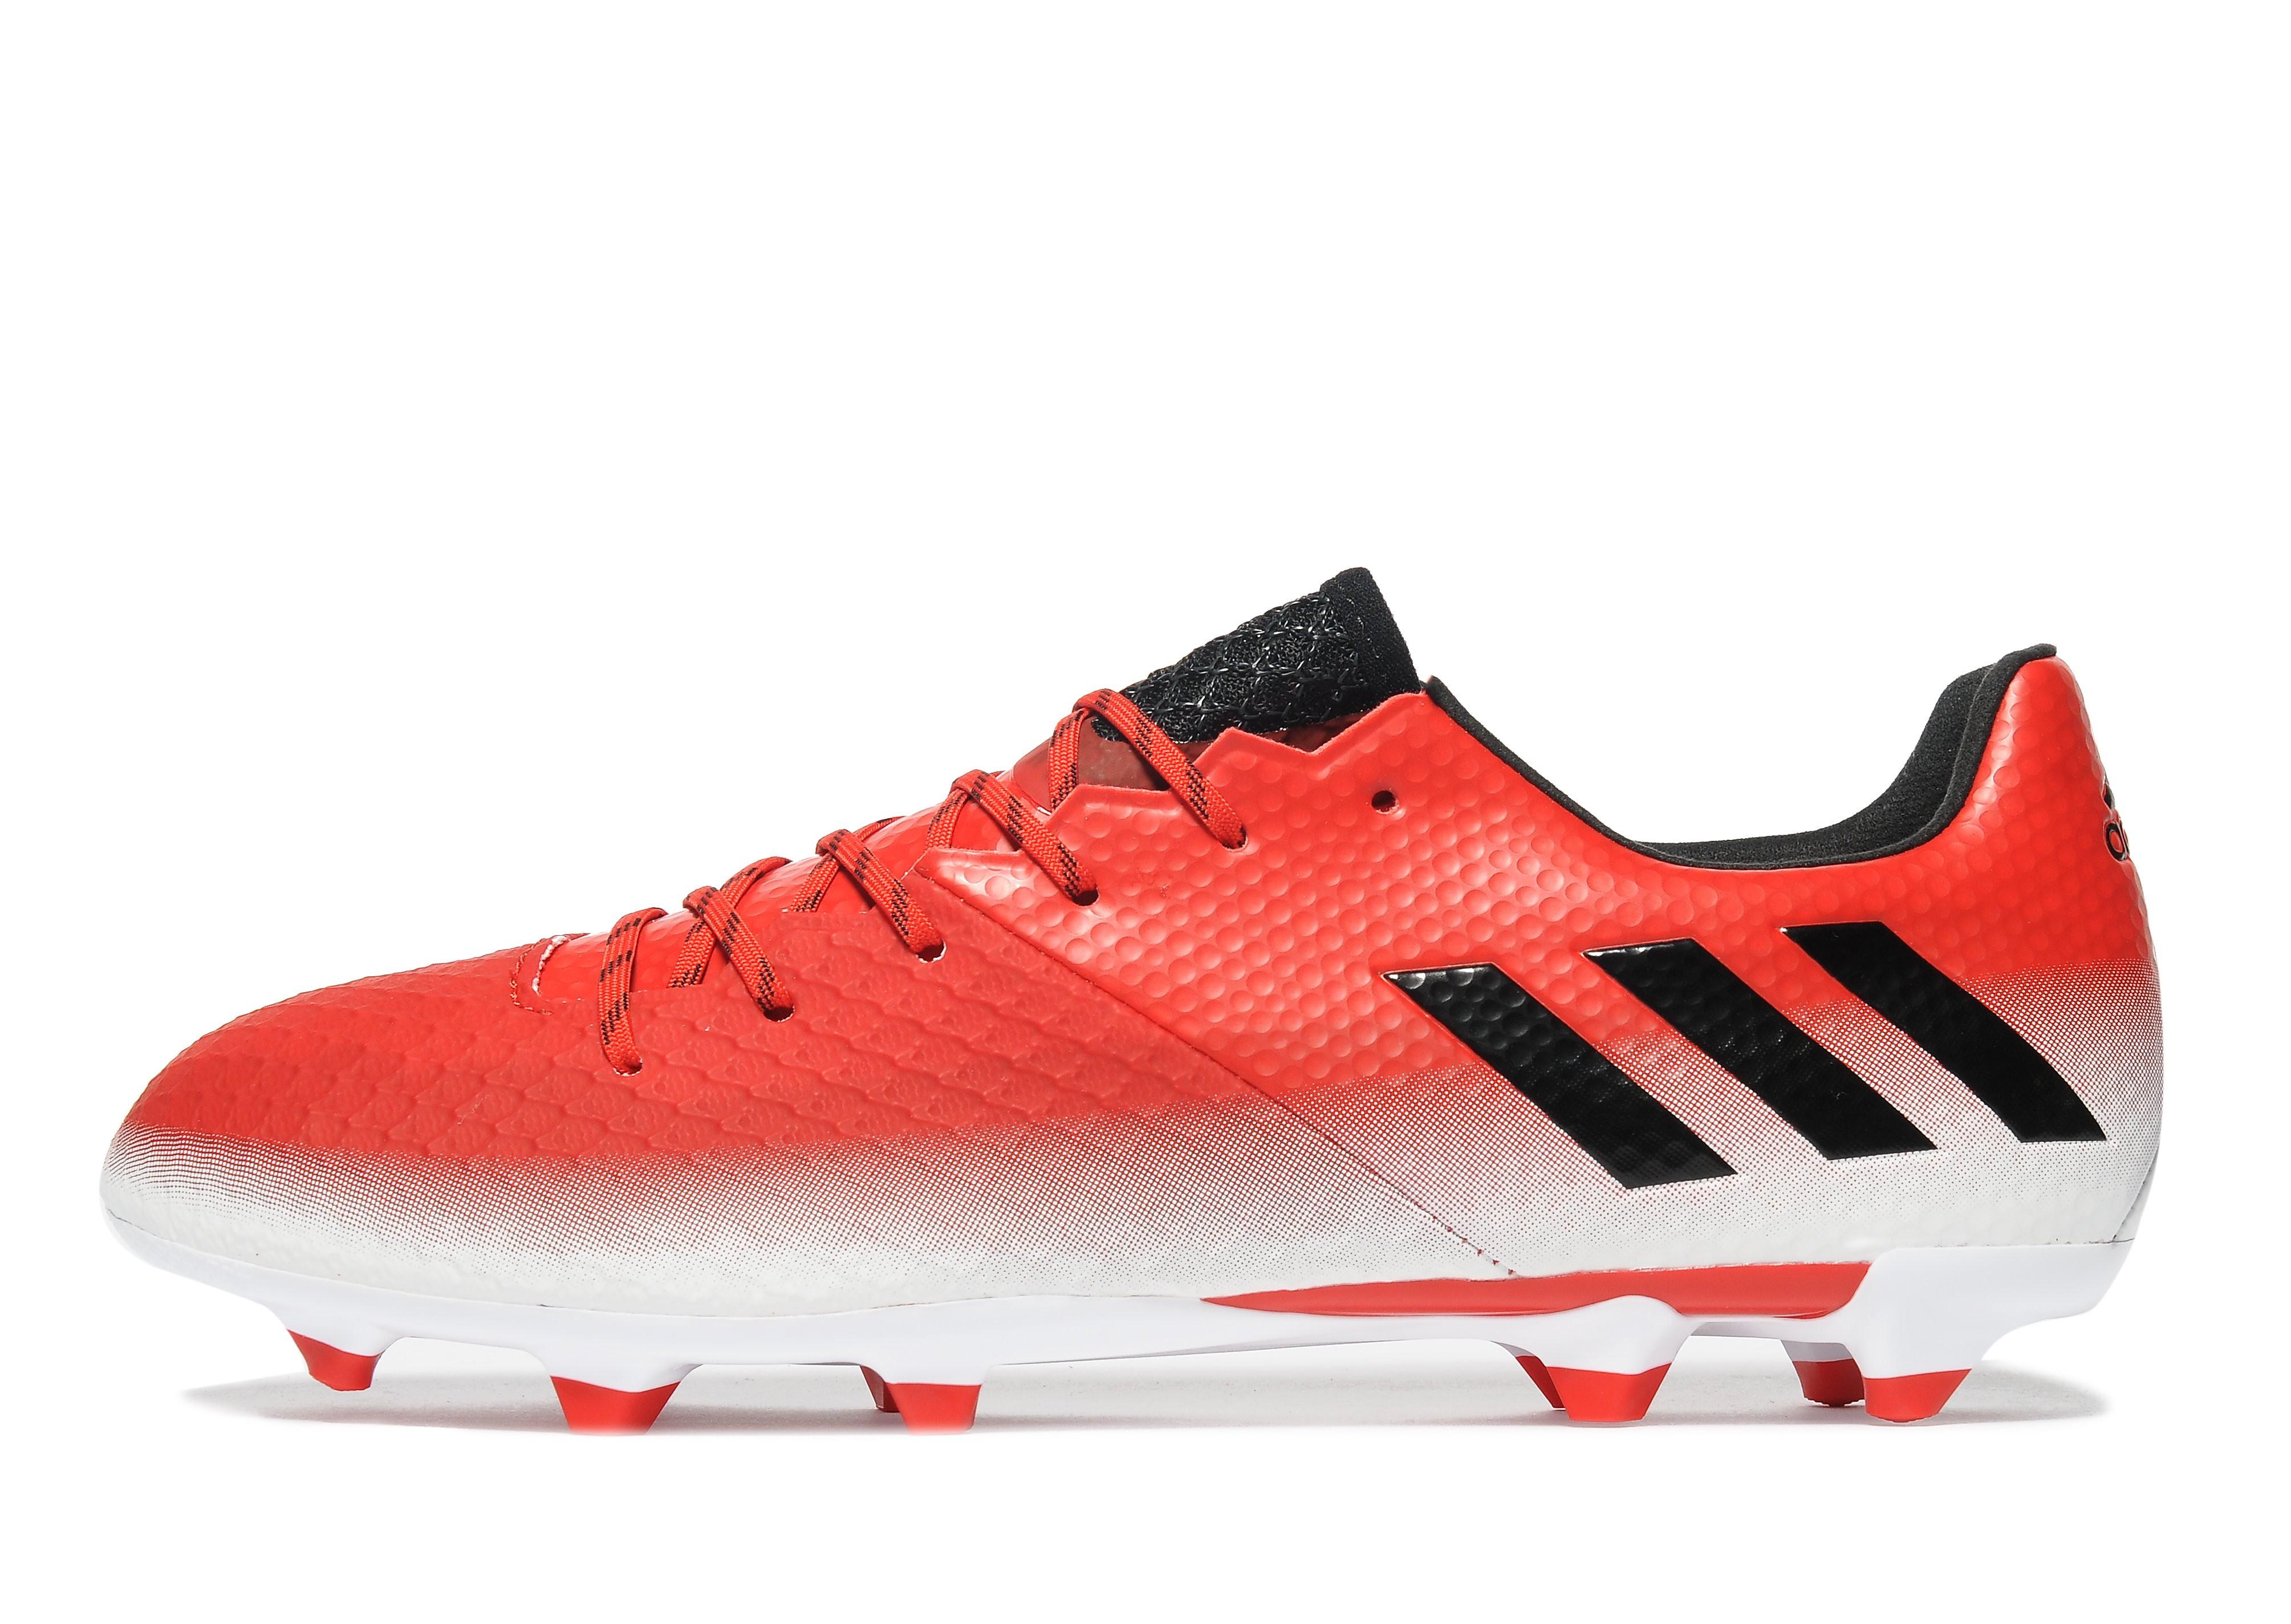 adidas Red Limit Messi 16.2 FG